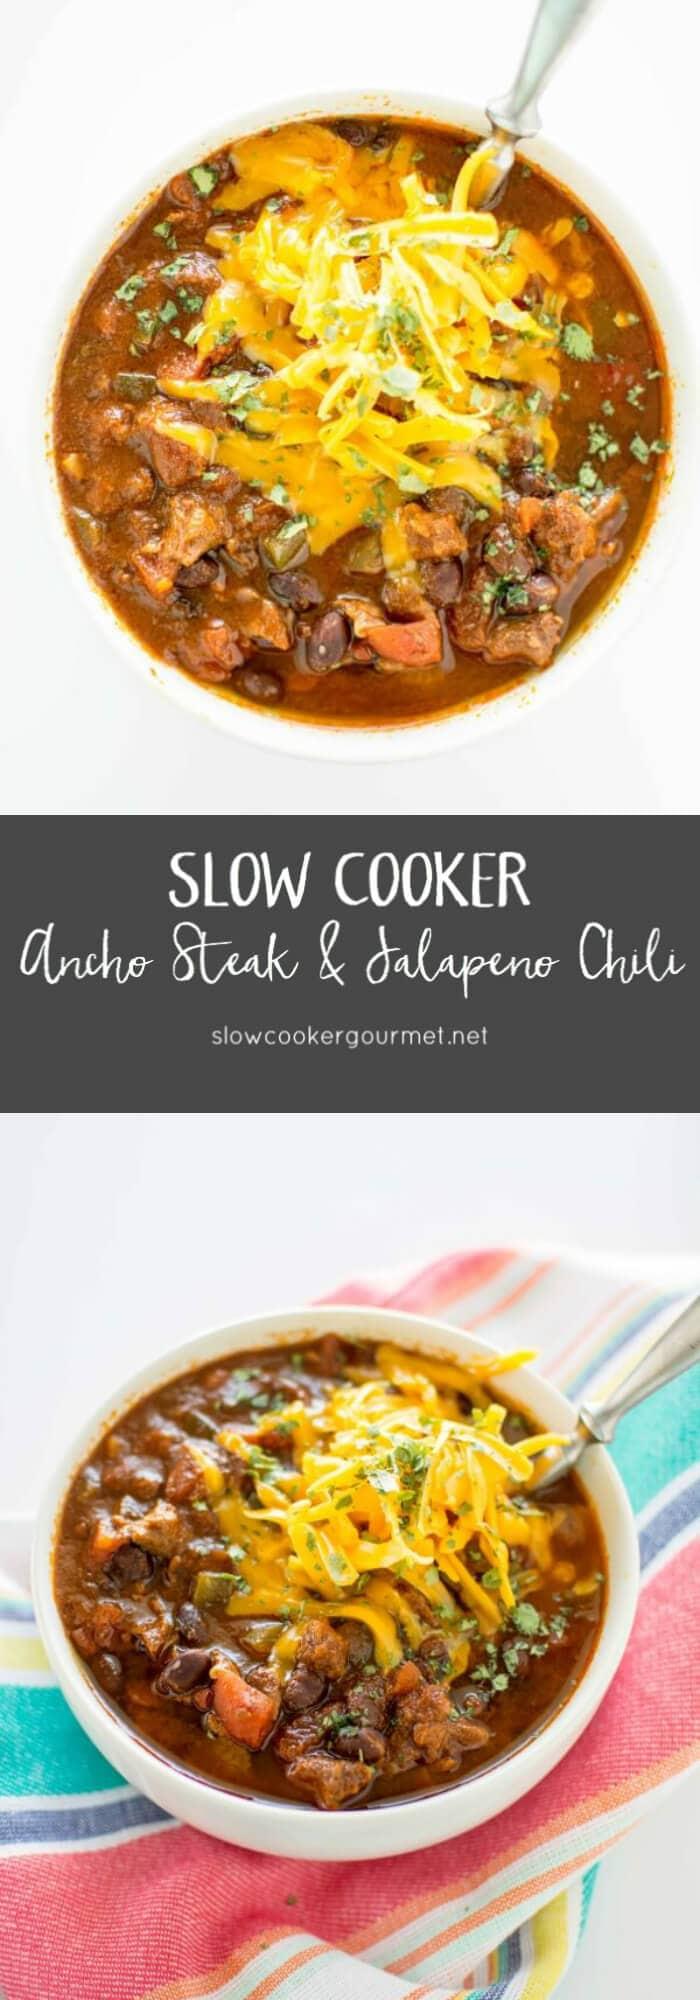 scg-ancho-steak-jalapeno-chili-longpin